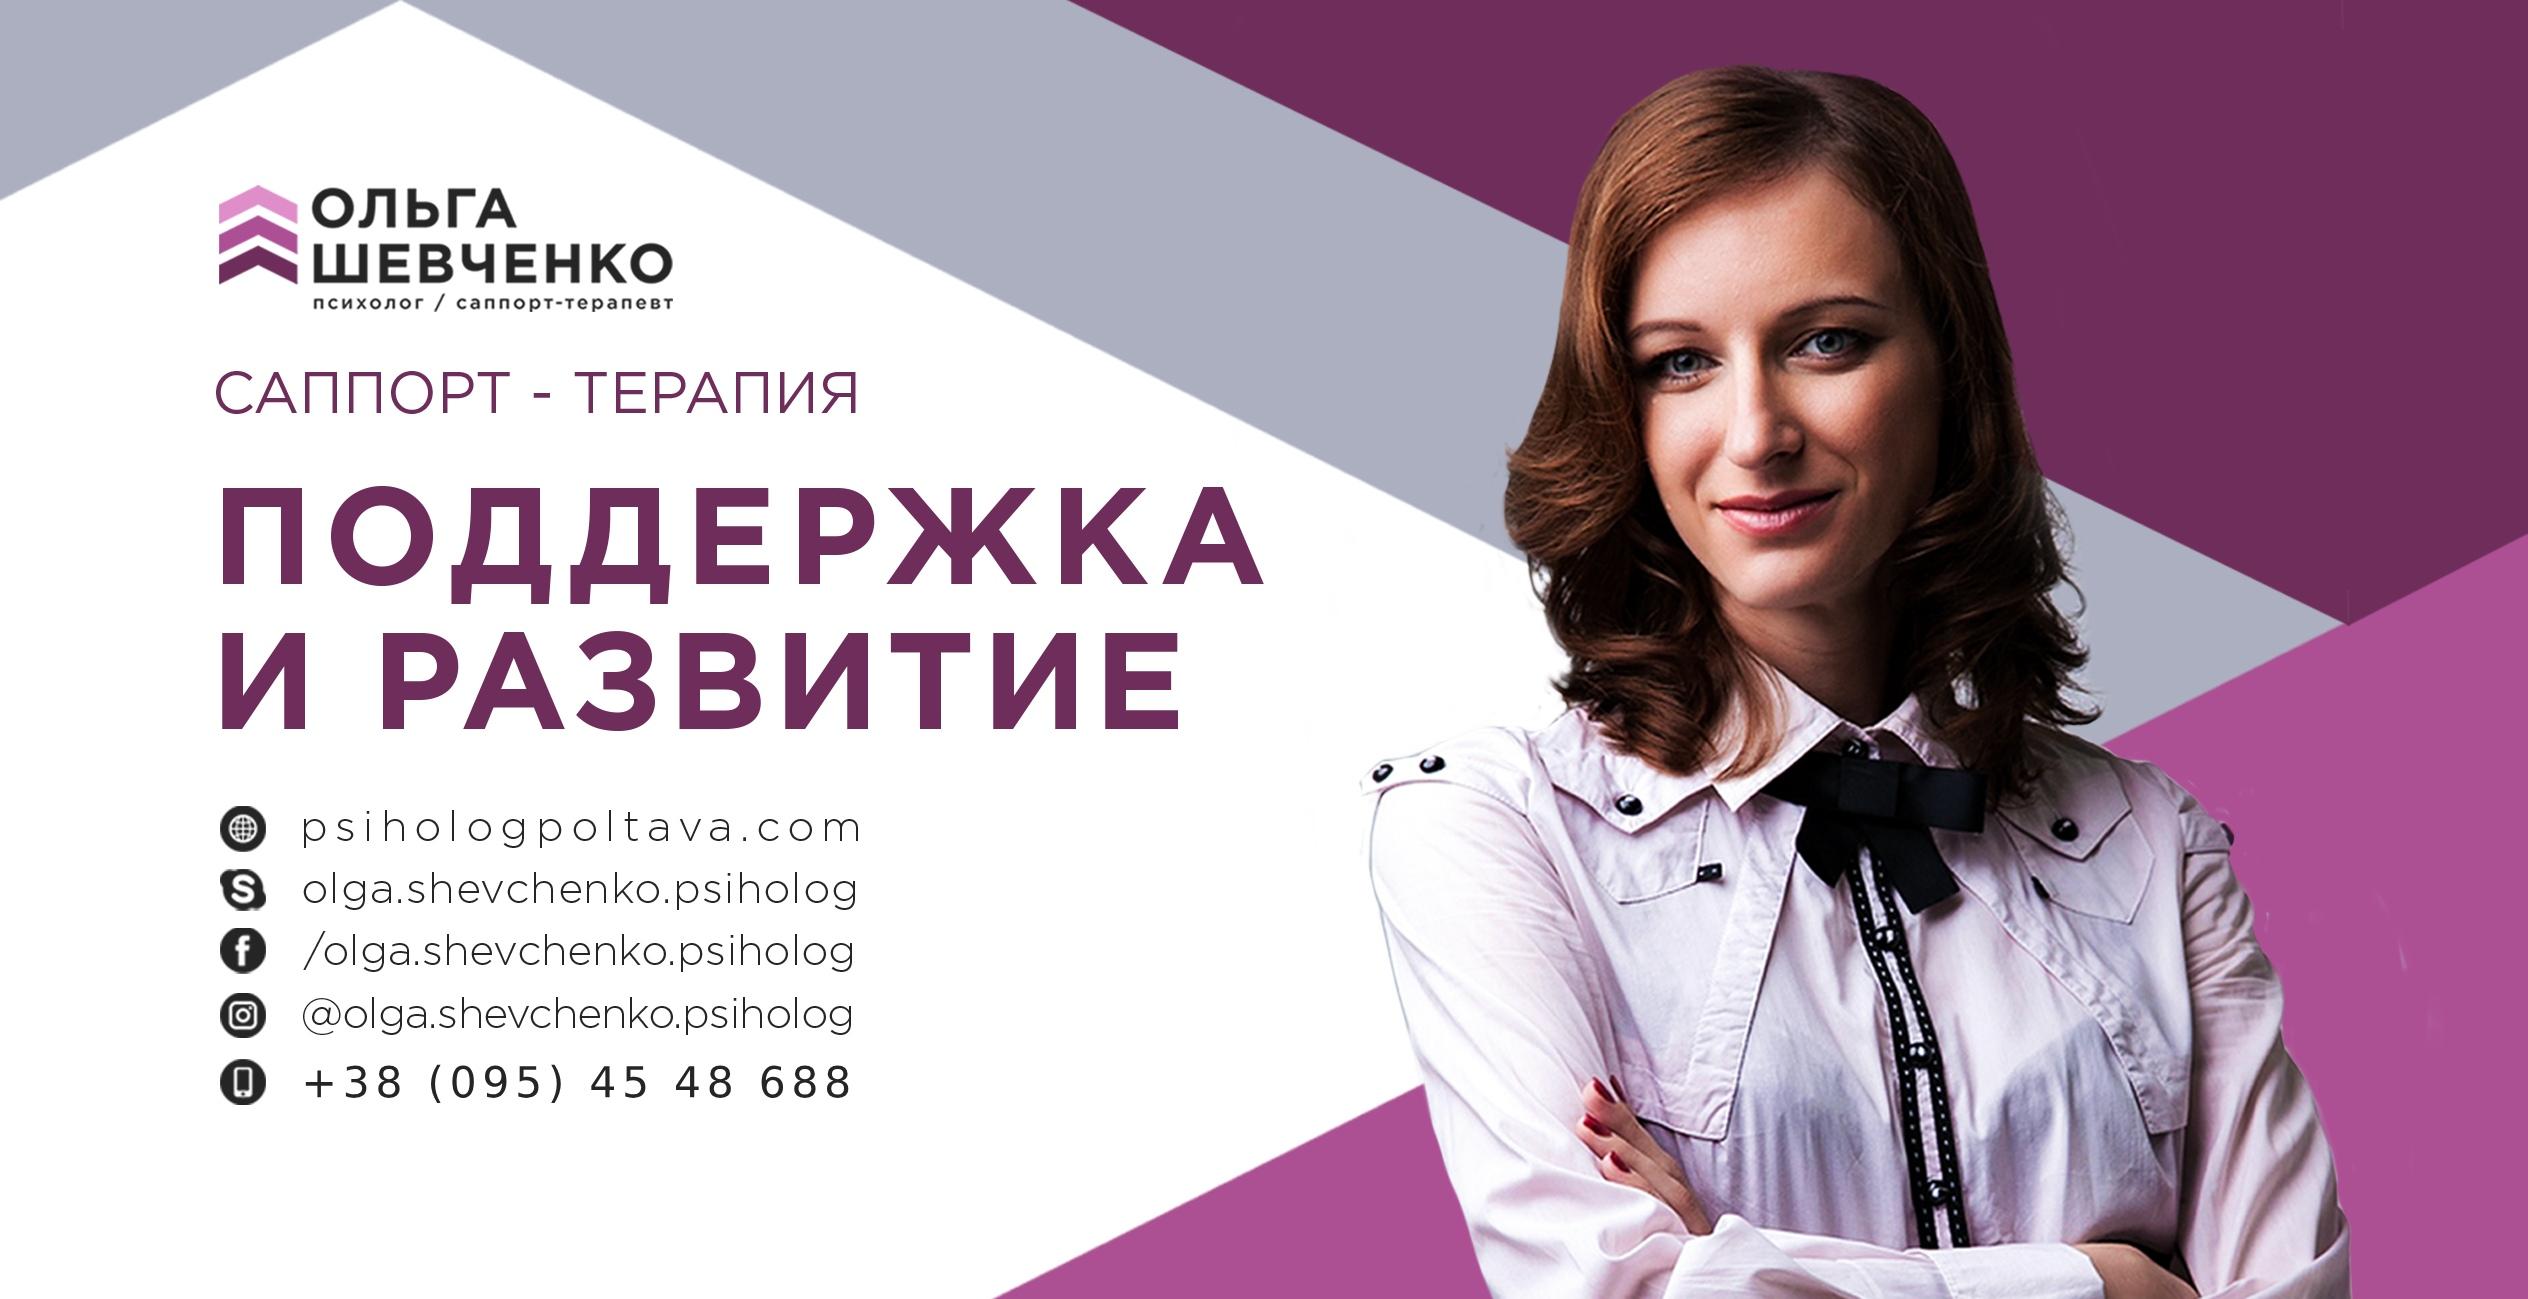 Психолог-консультант Ольга Шевченко